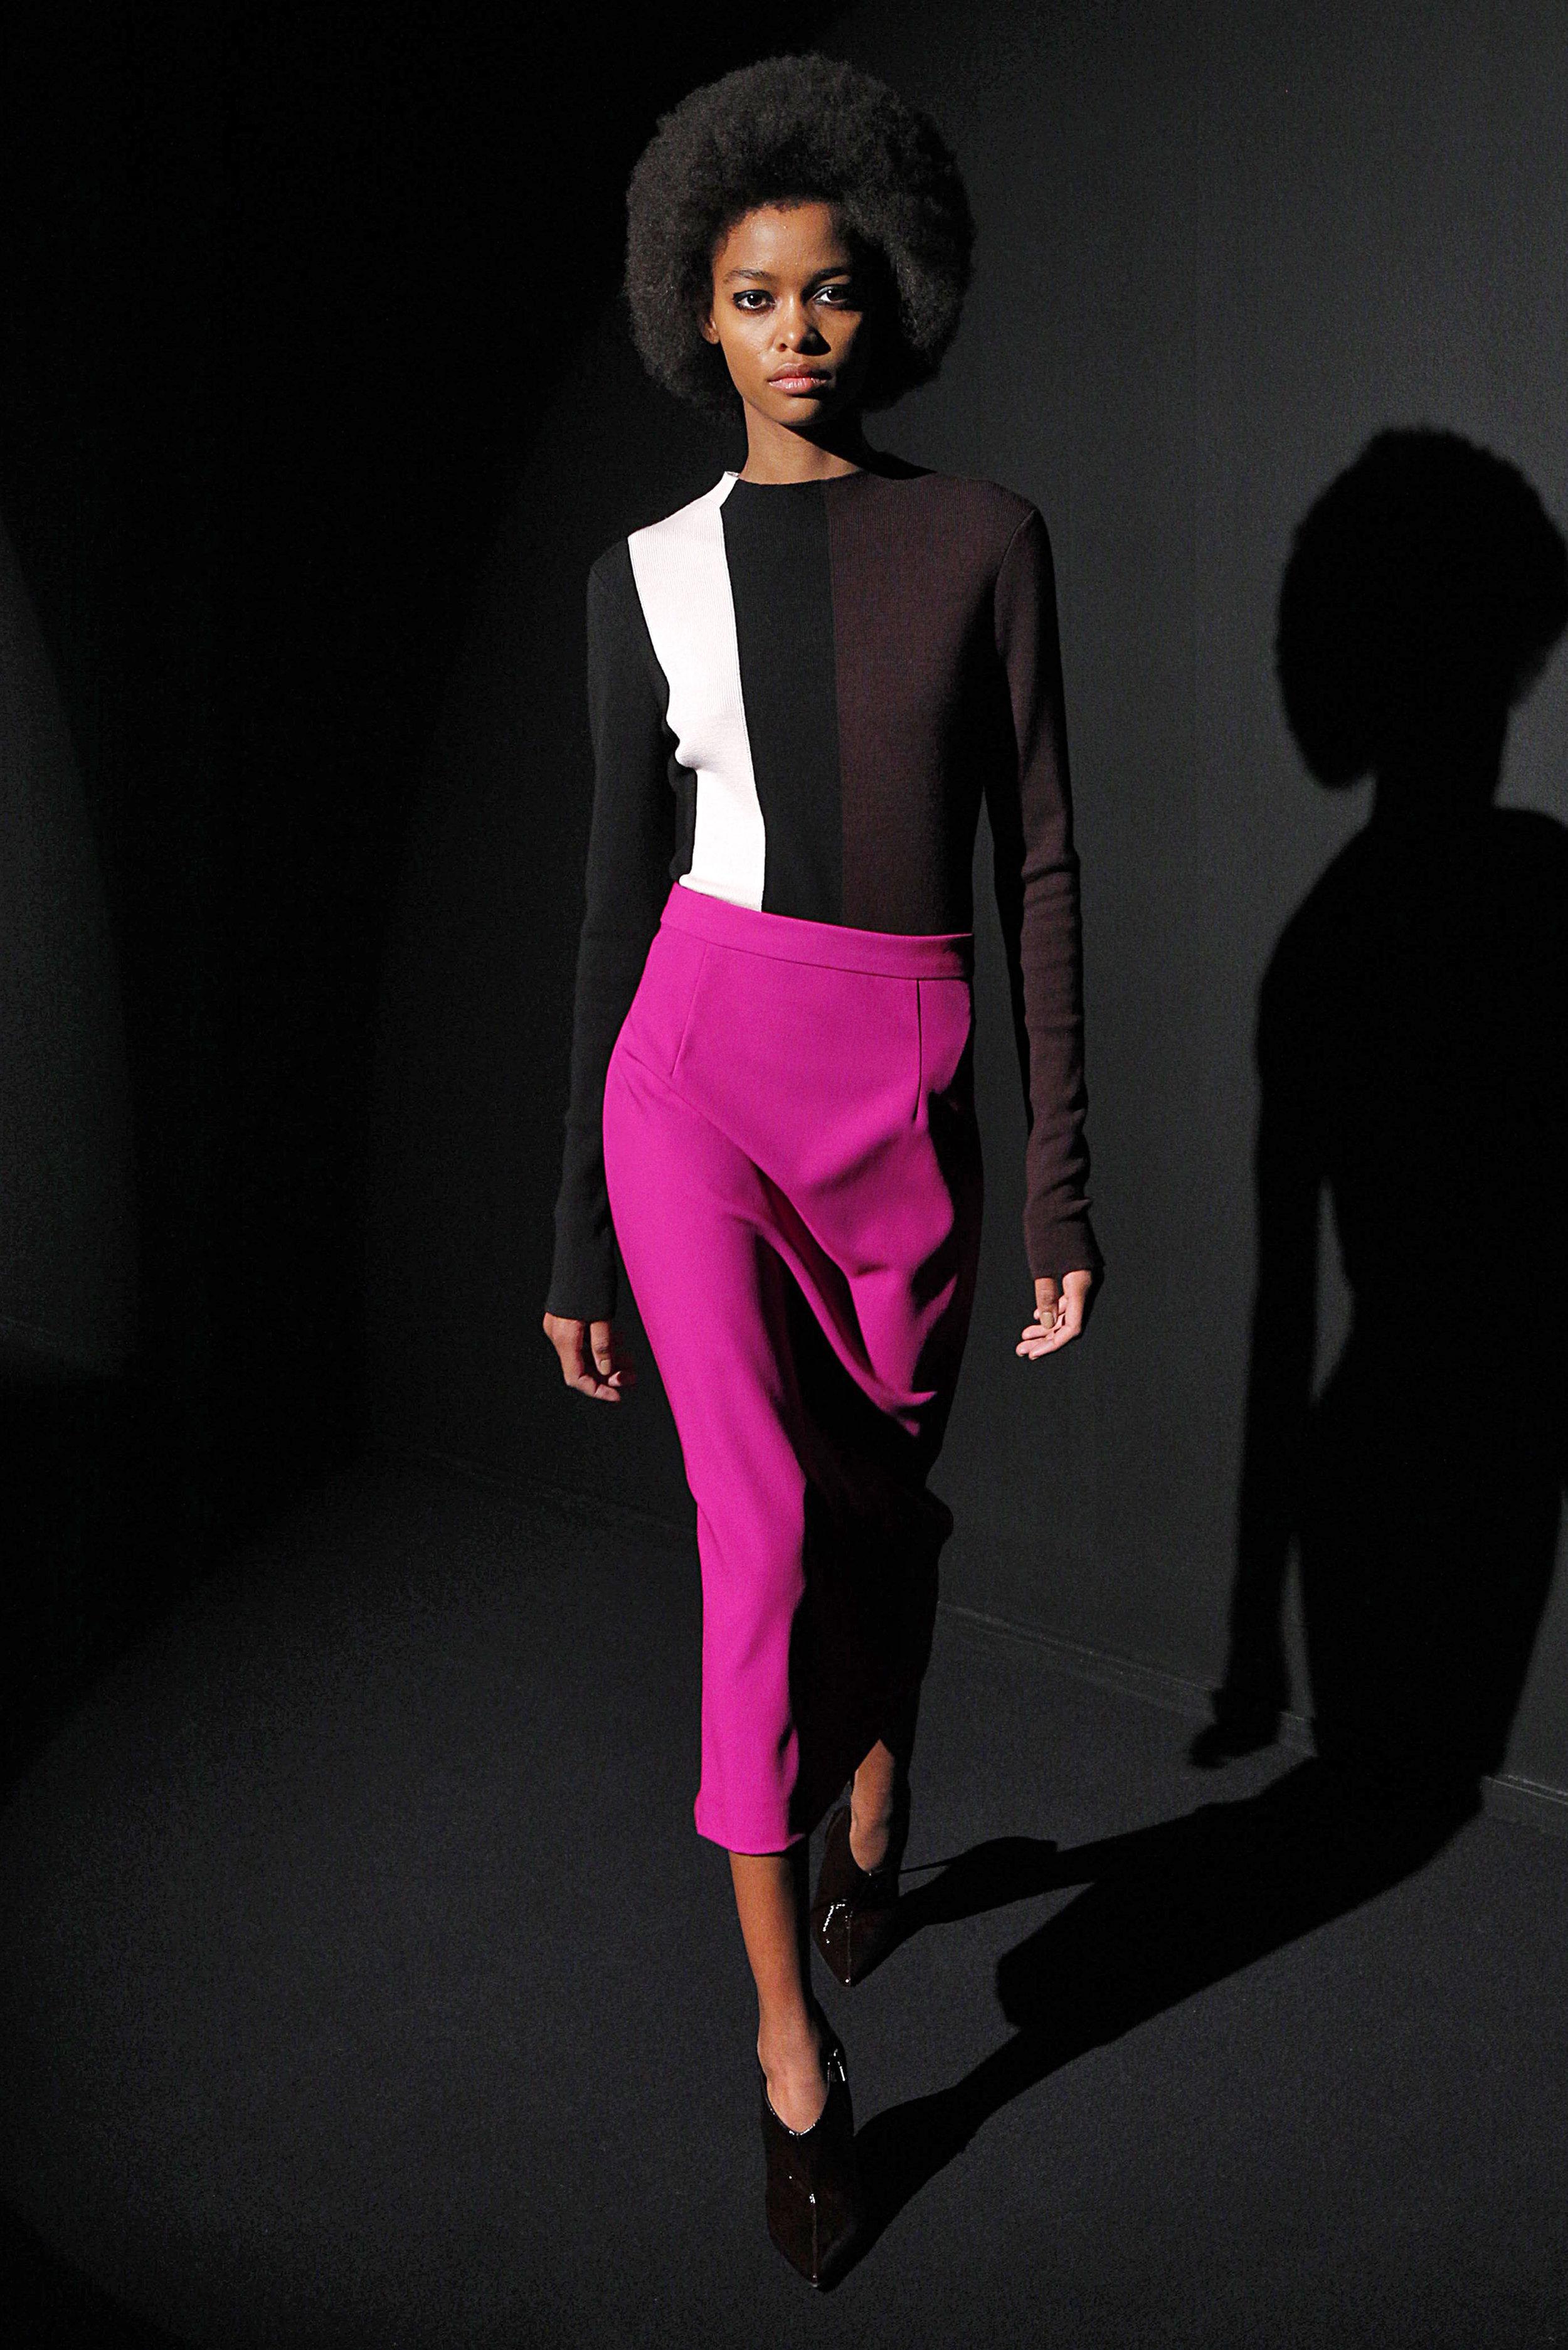 Look 12 Burgundy/black/pink long sleeve turtleneck with fuchsia wool barathea skirt.